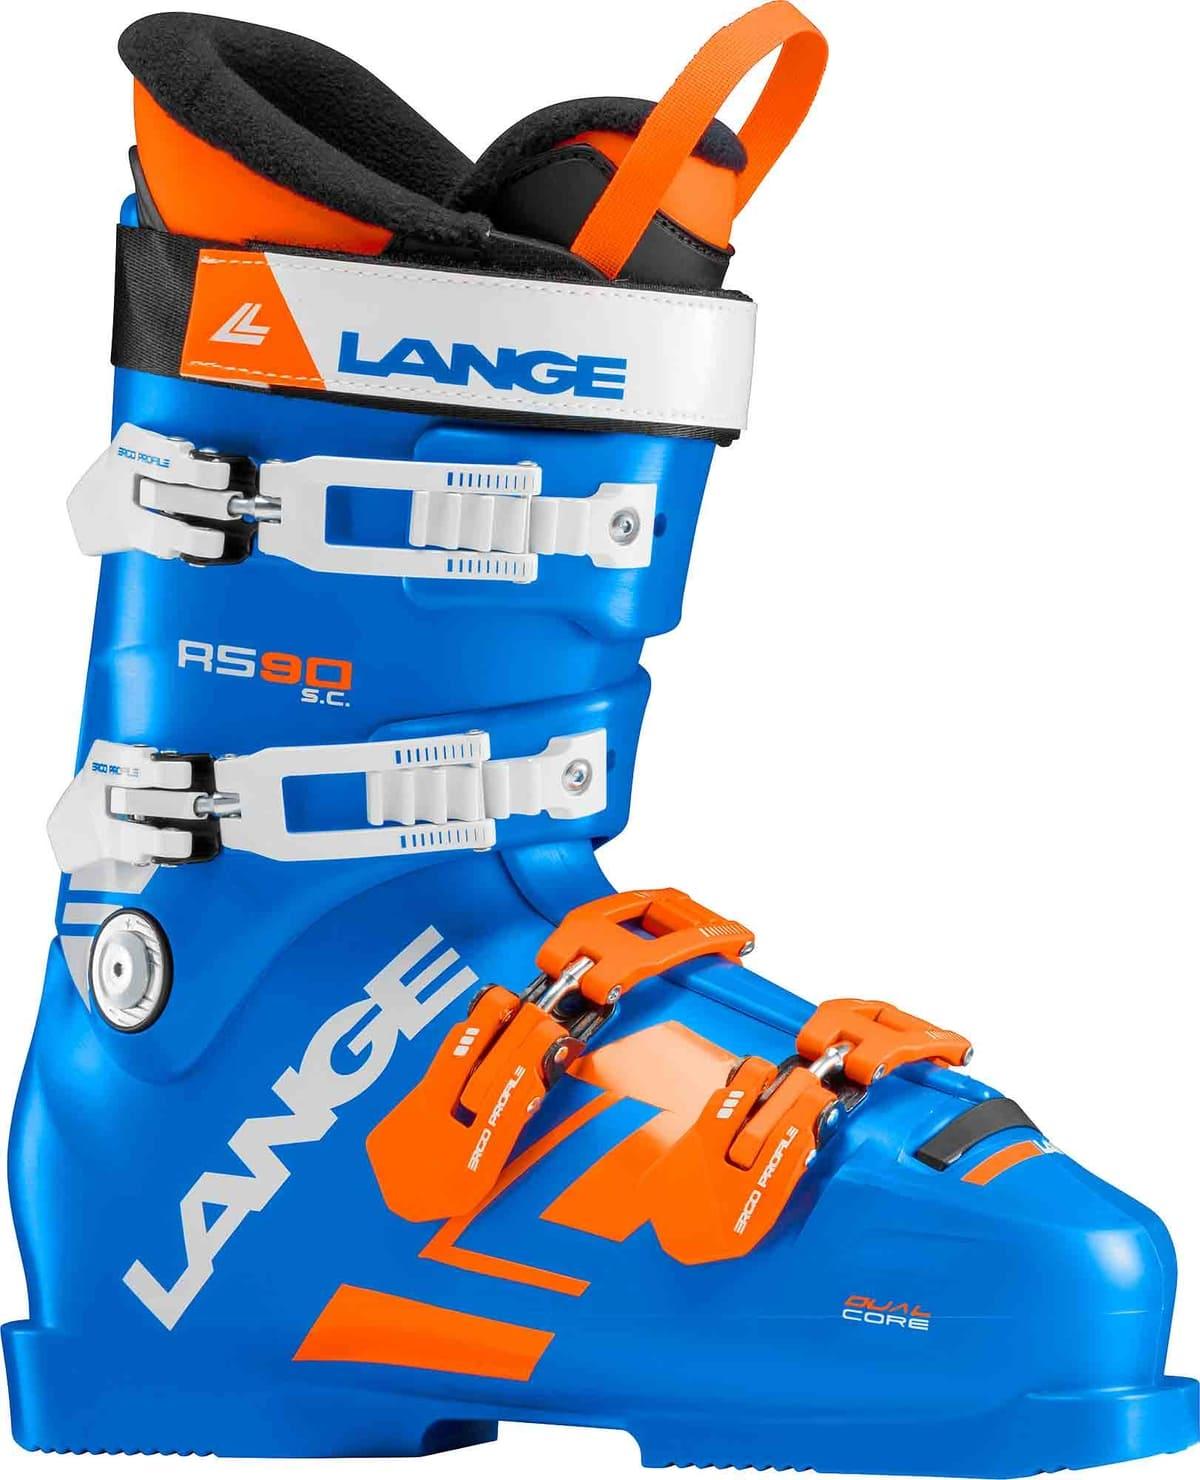 Lange RS 90 S.C. Power Blue - 25,5